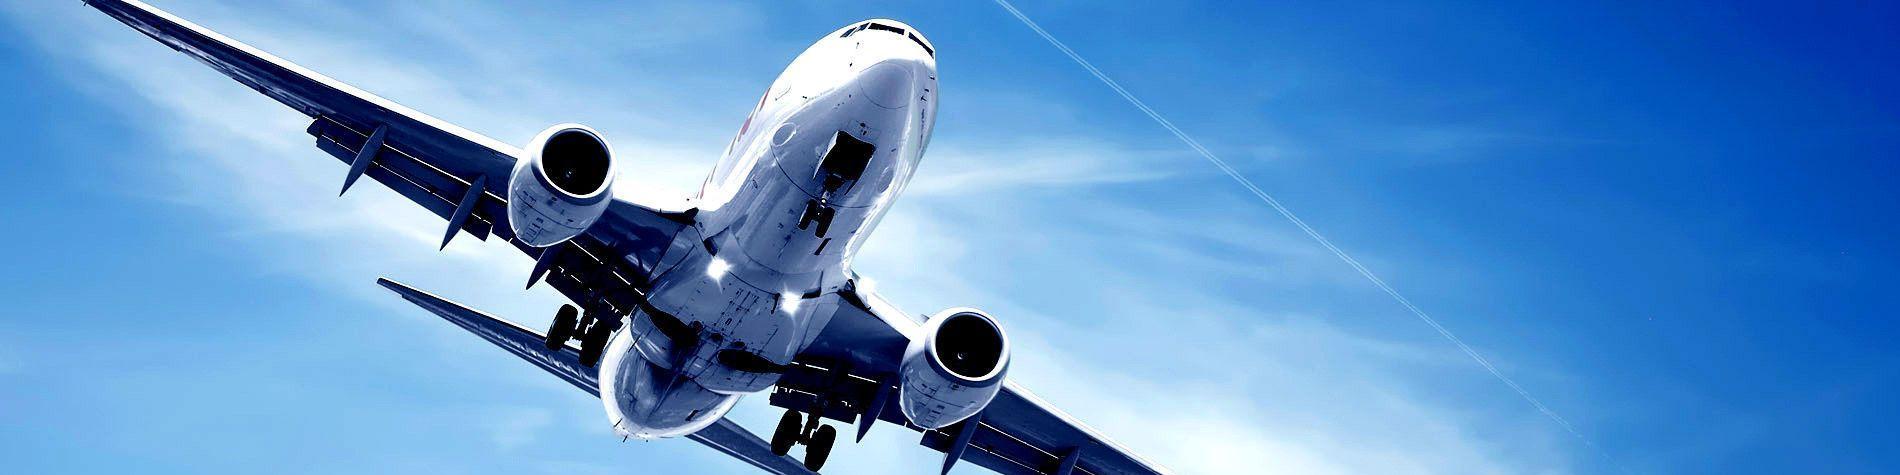 Permalink to: Редовни авиолинии